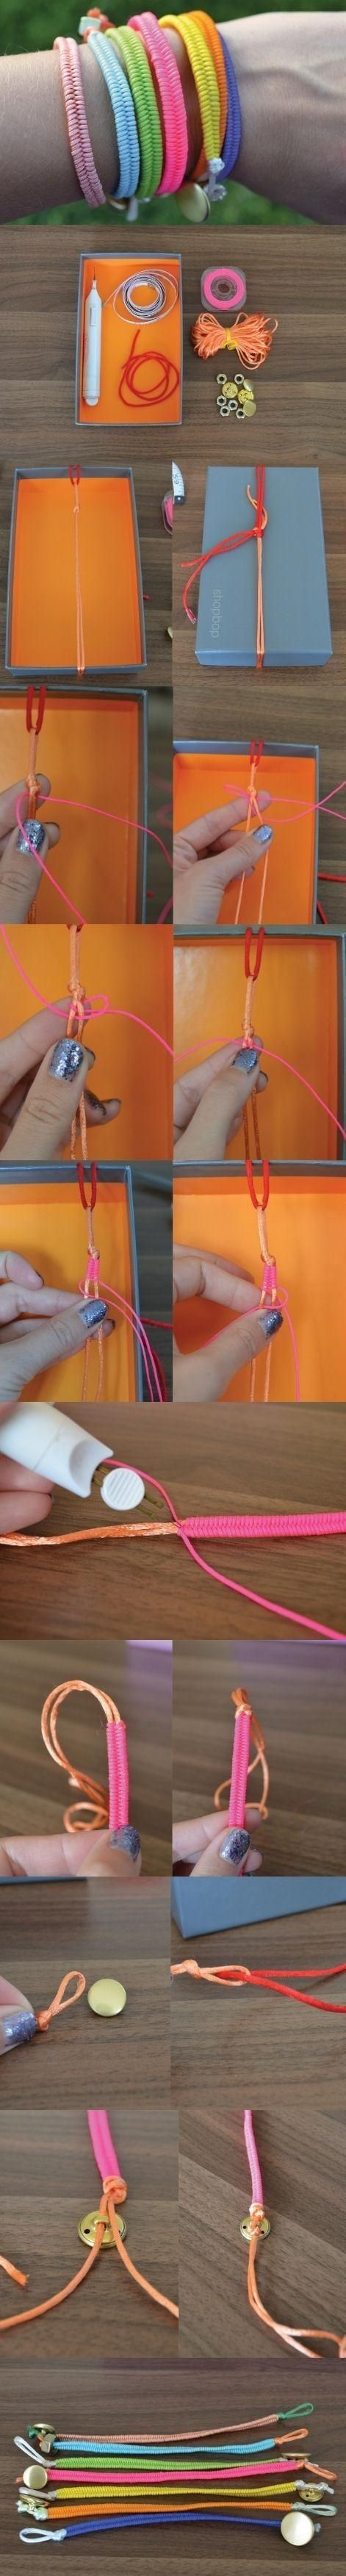 DIY Fishtail Bracelet DIY Fishtail Bracelet by diyforever